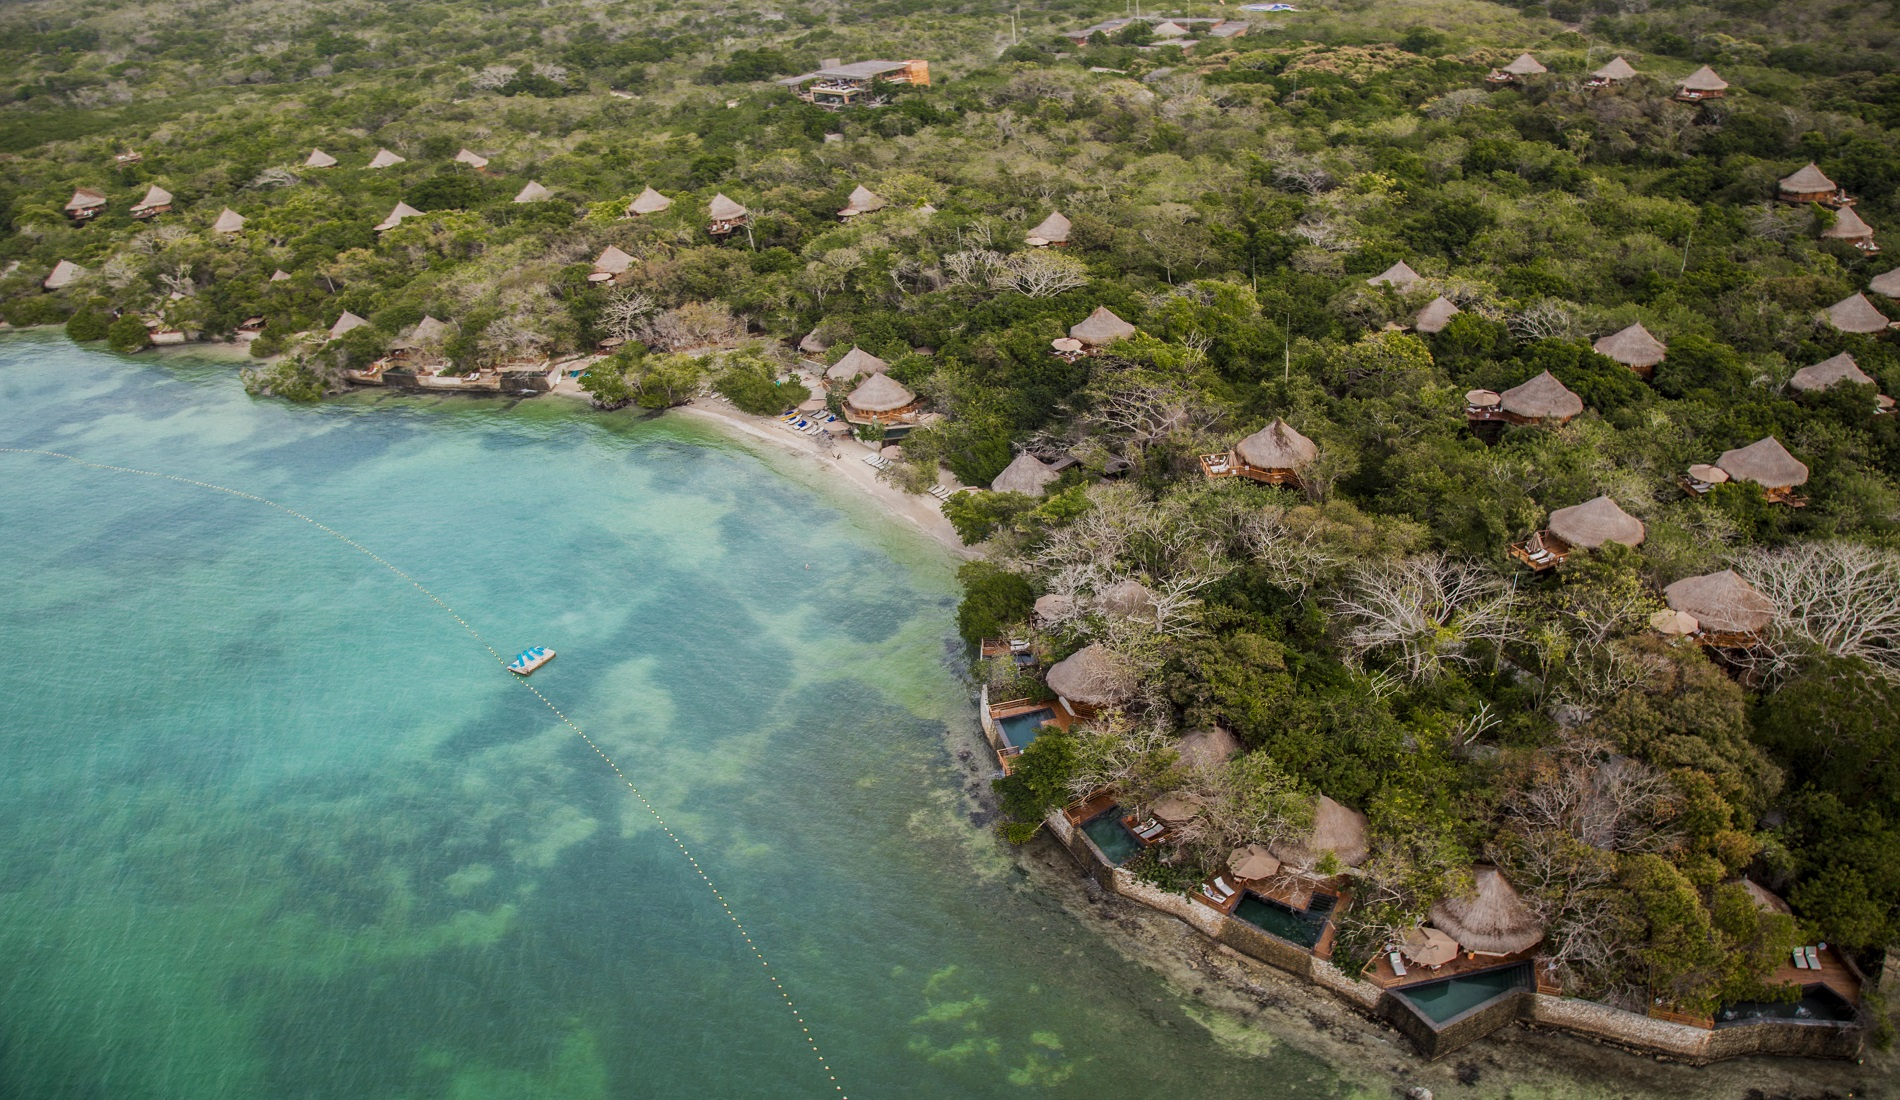 isla baru rondreis colombia